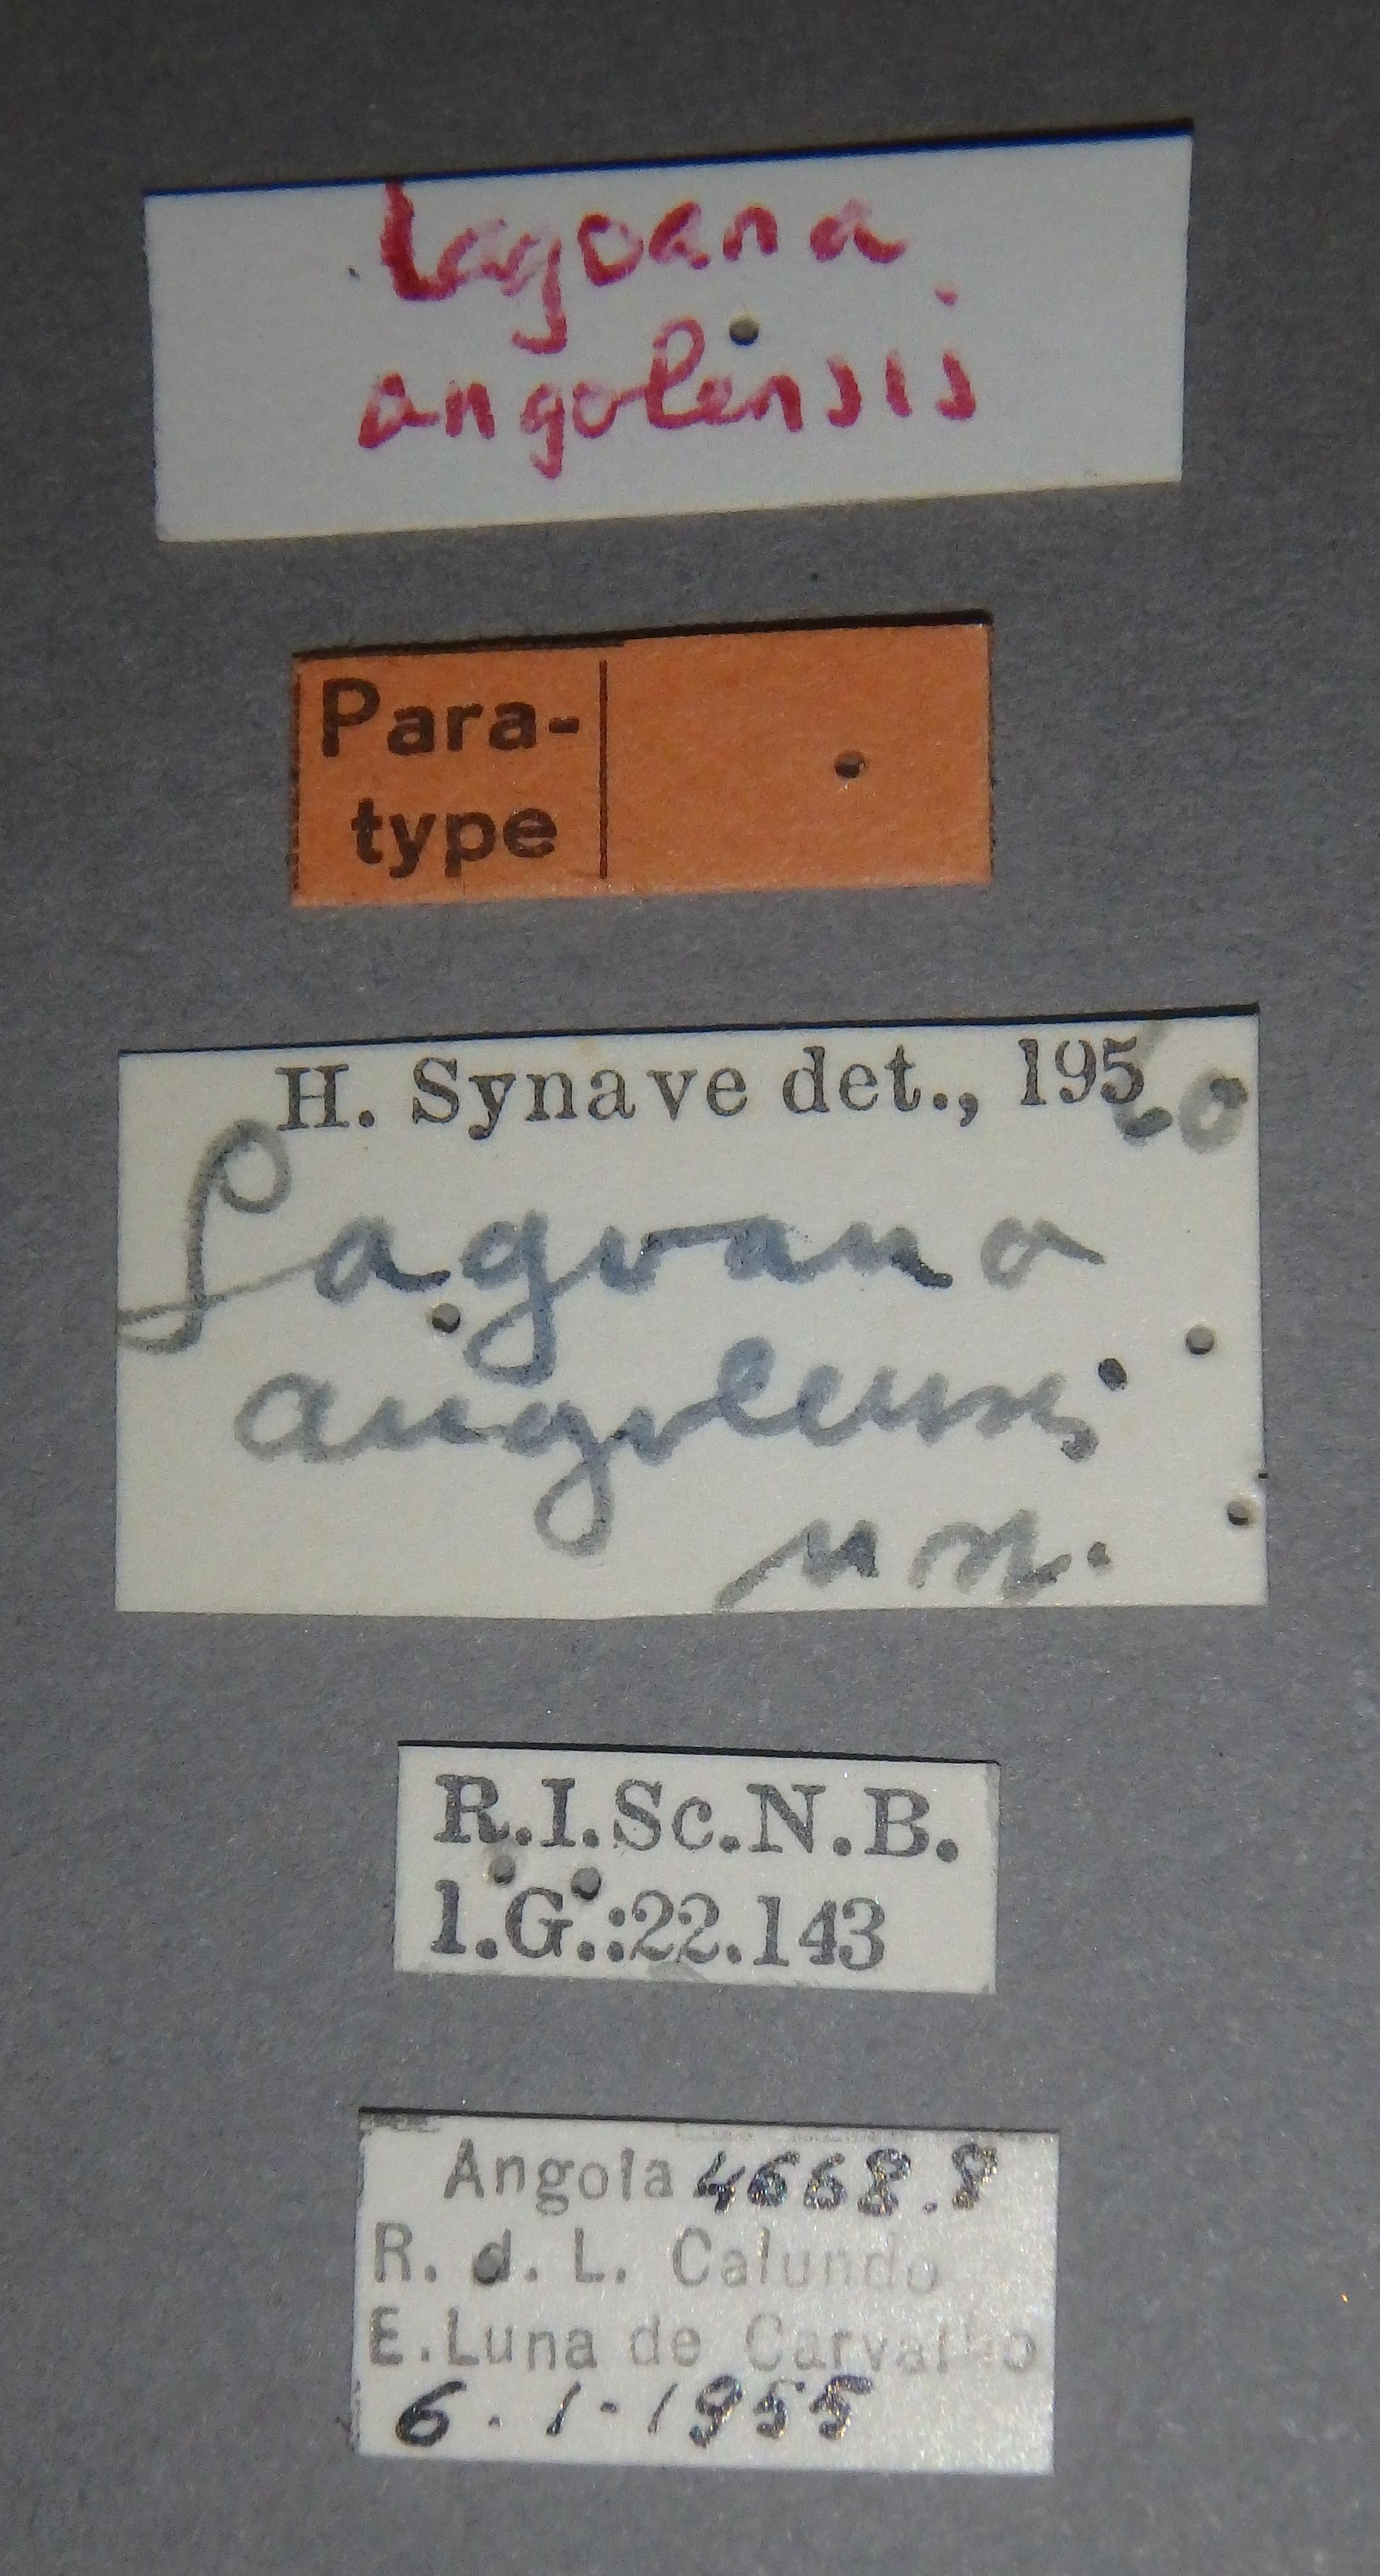 Lagoana angolensis pt2 Lb.JPG